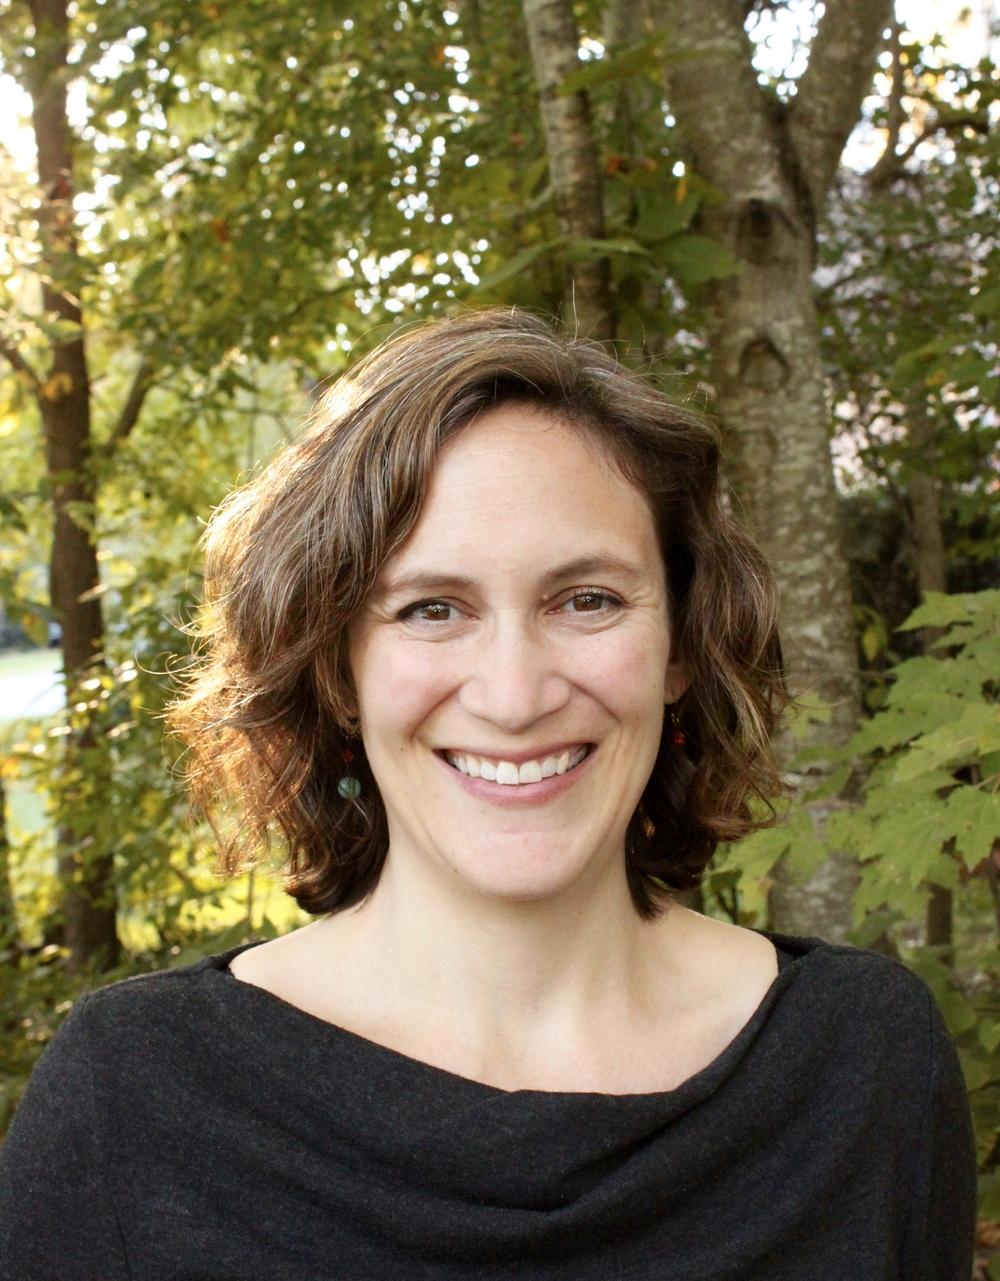 Caroline Hexdall, Ph.D.